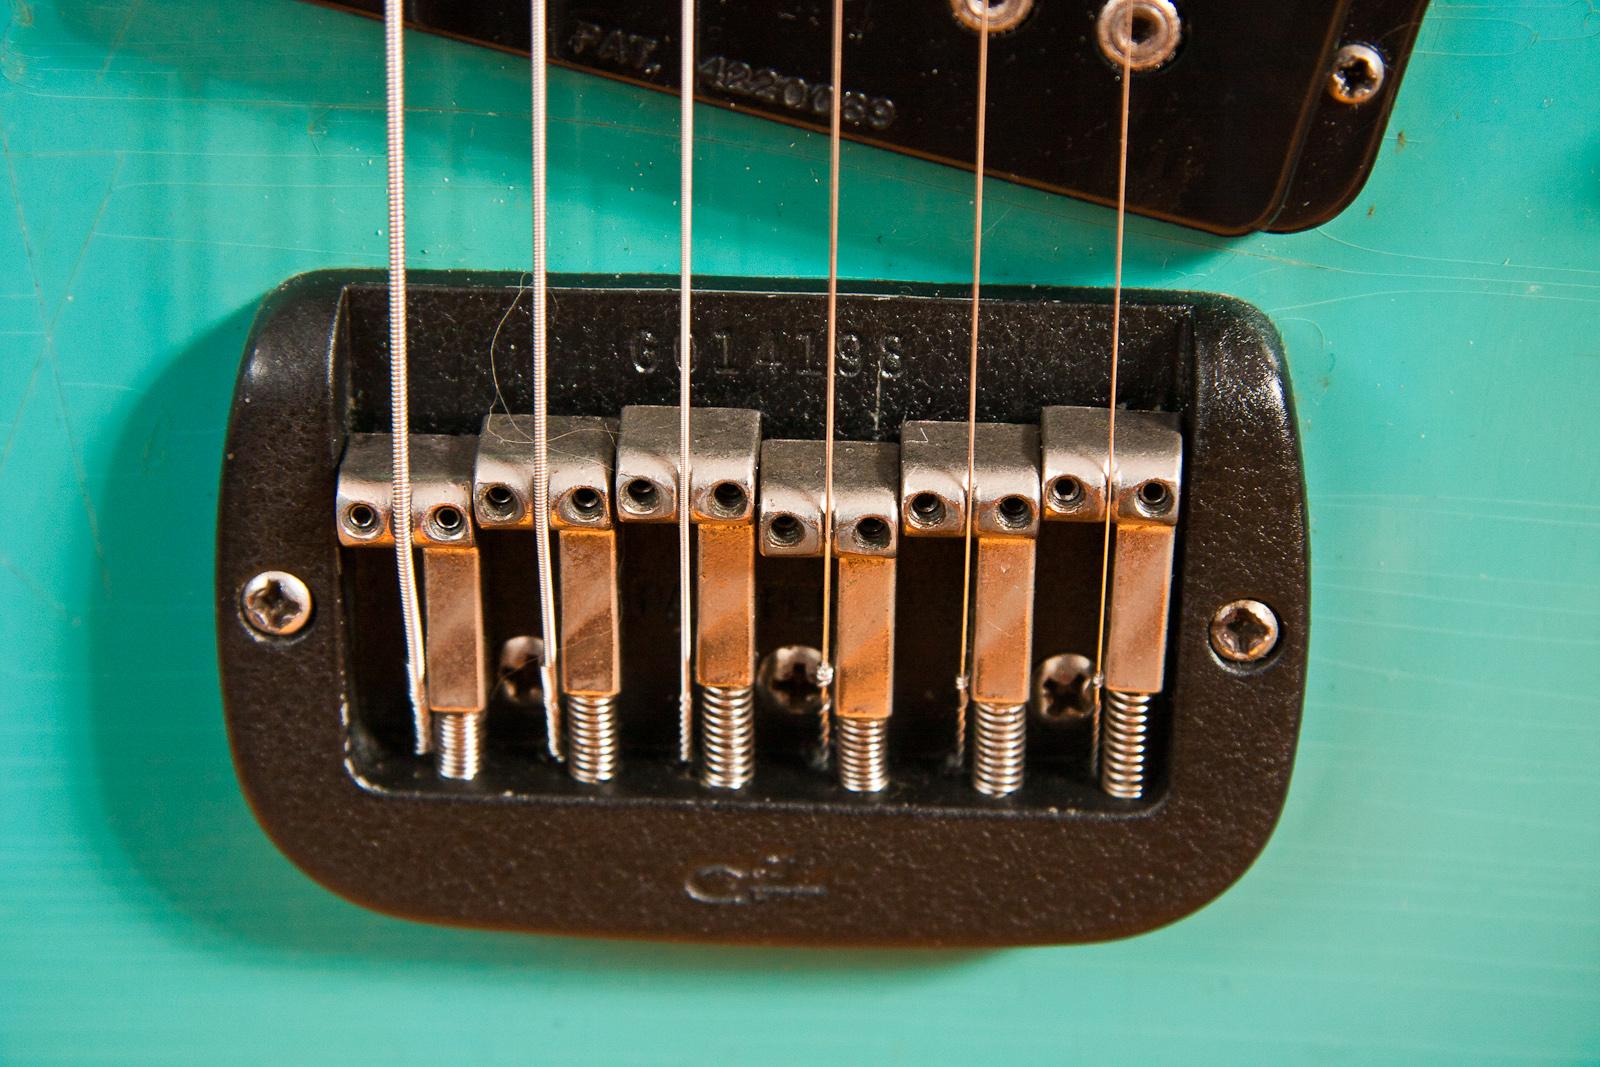 G L Asat Clic Wiring Diagram -|- nemetas.aufgegabelt.info G L Asat Special Wiring Diagram on g l guitar legacy wiring, tribute asat classic blues boy wiring, with guitar blend pot wiring,